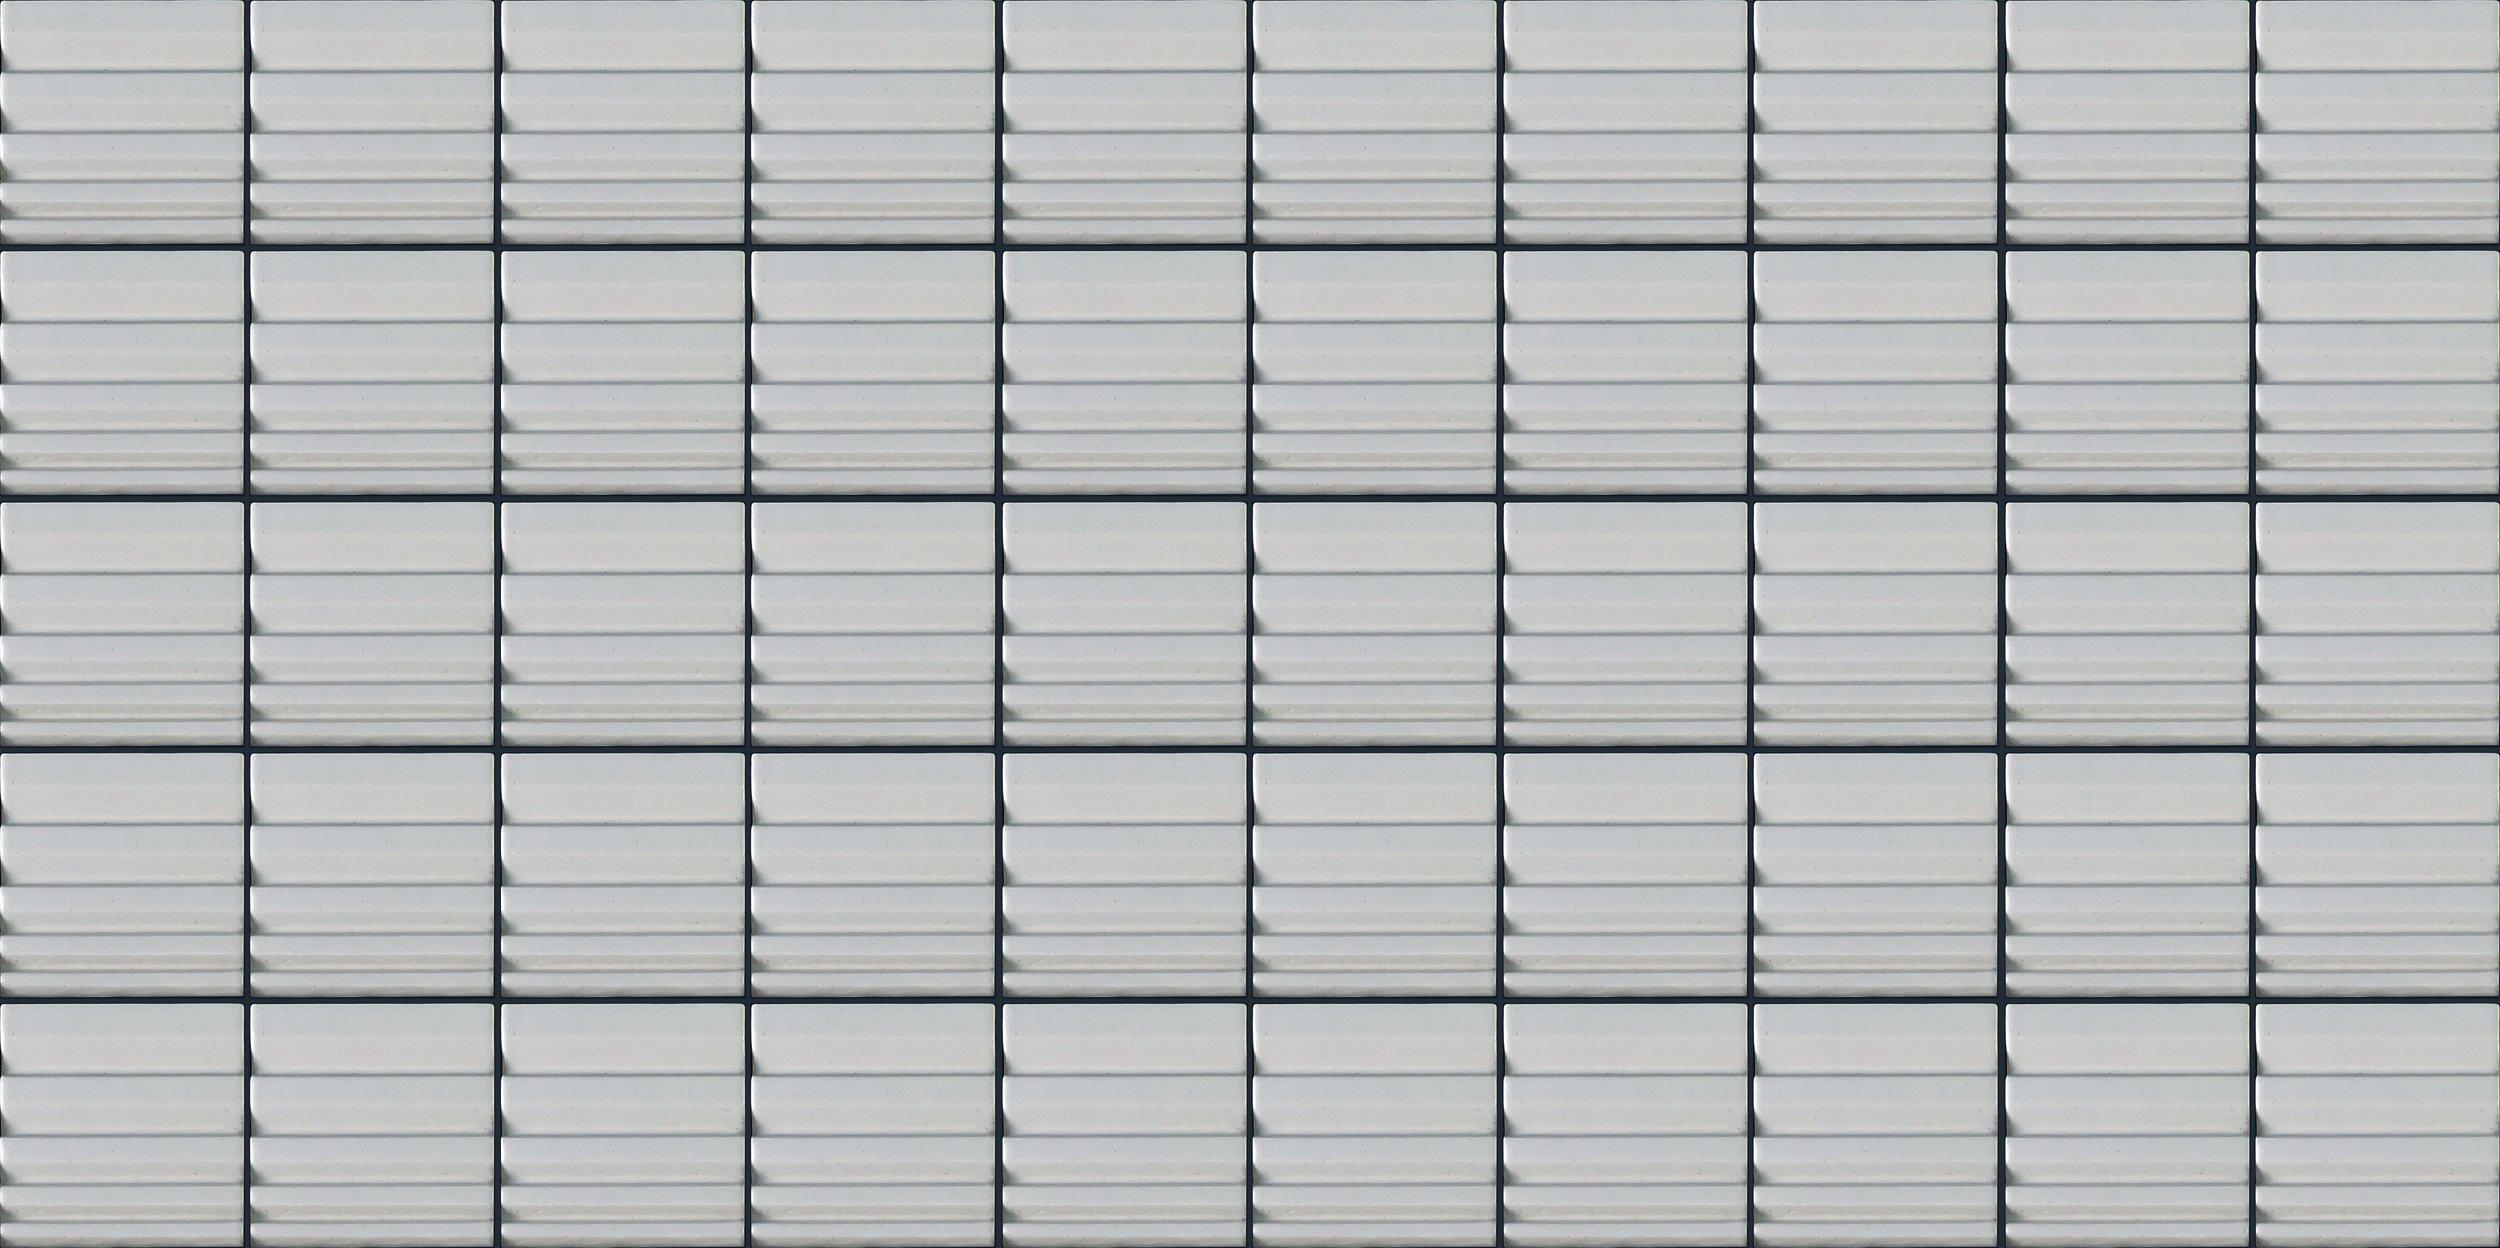 RF441 : Pattern D